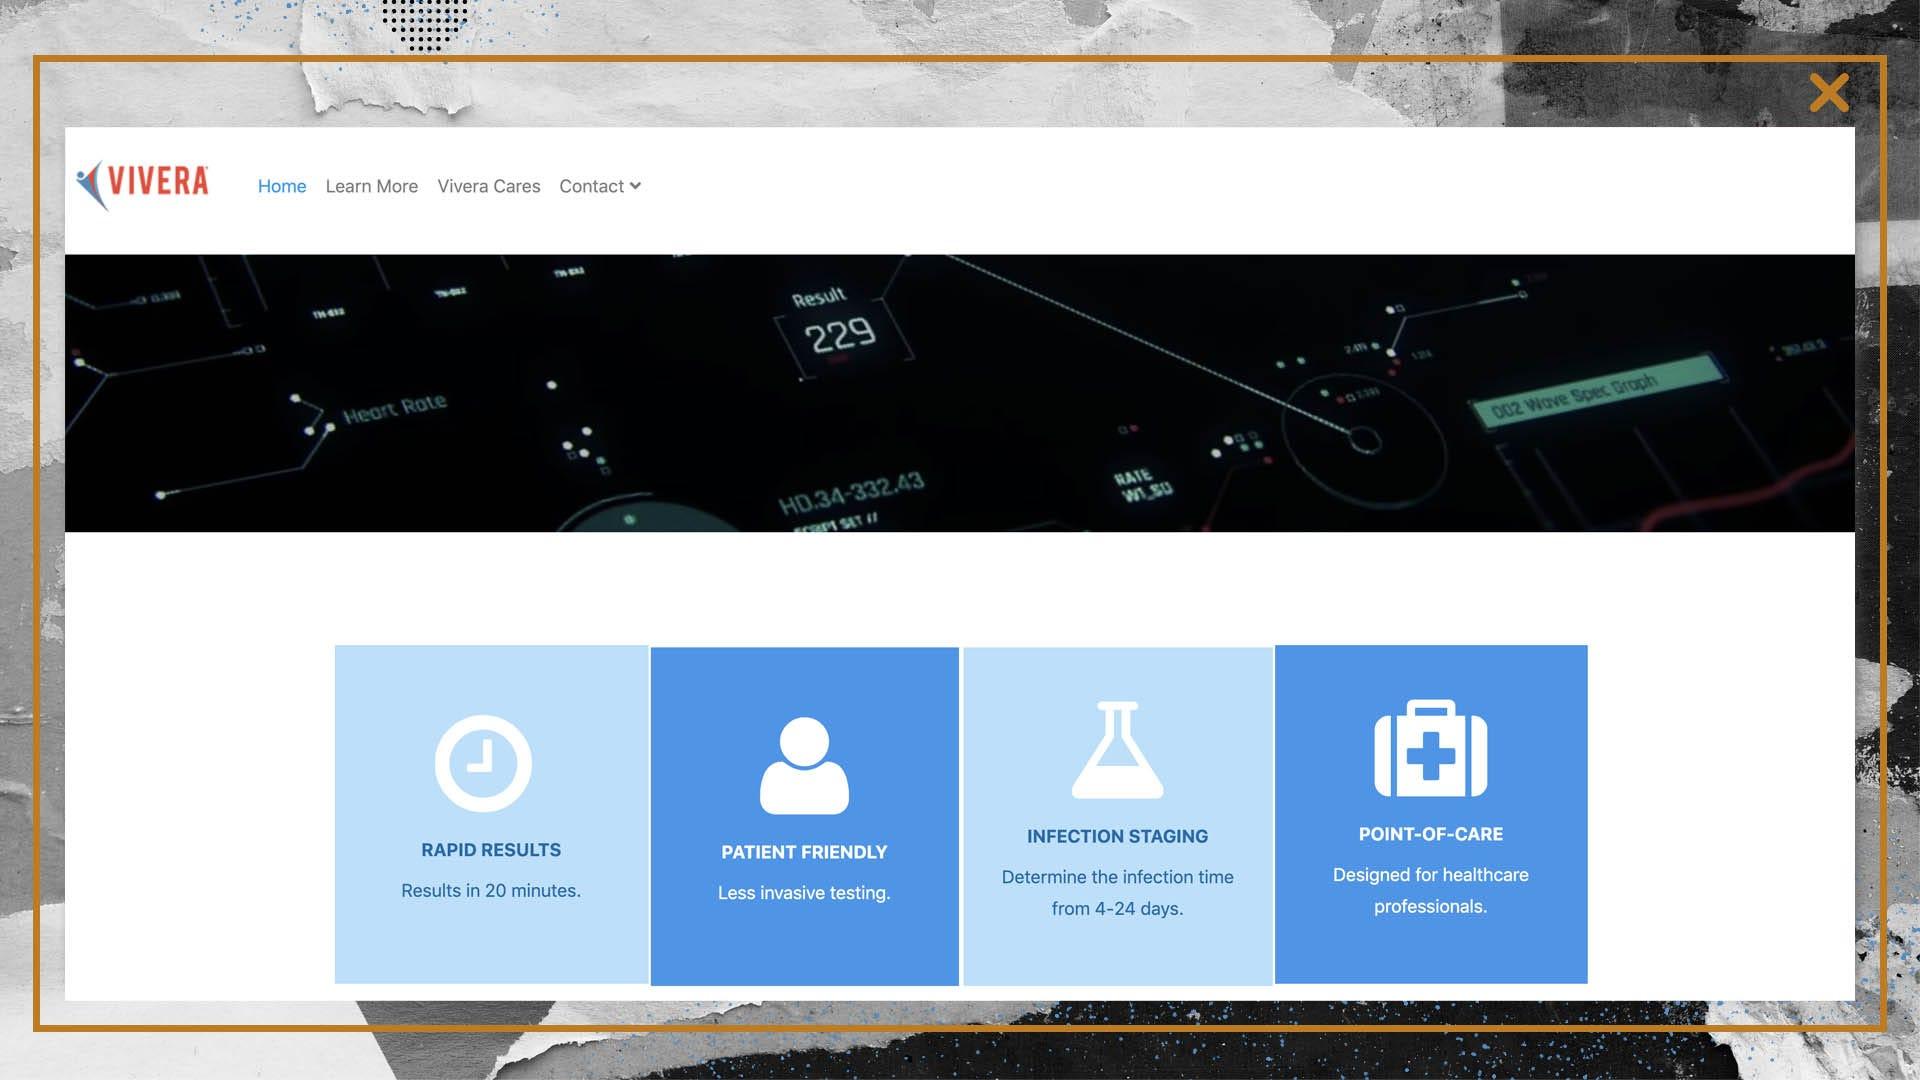 A screenshot of Vivera's website.